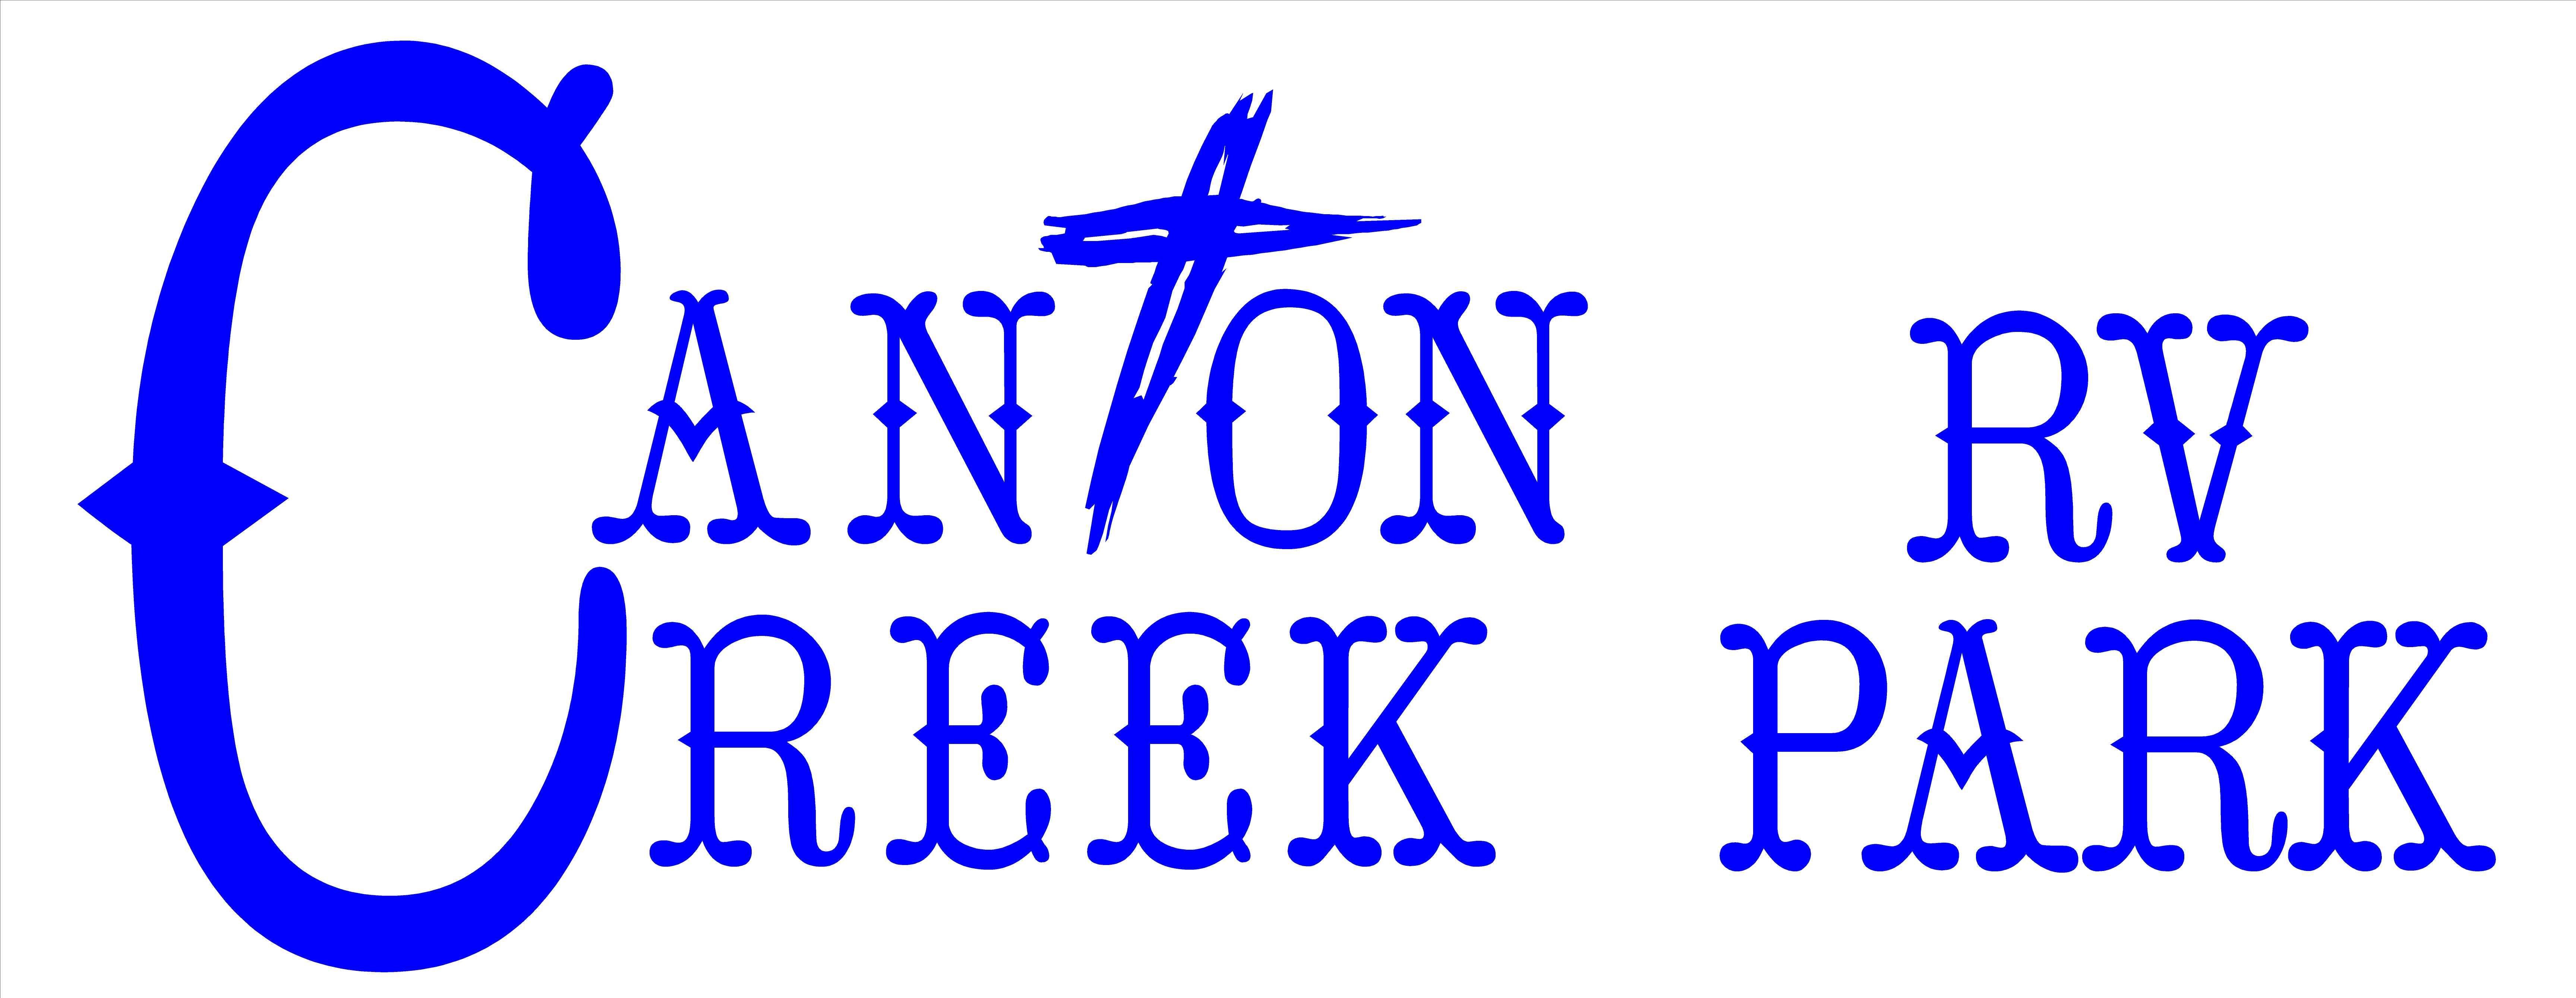 Canton Creek RV Park image 0